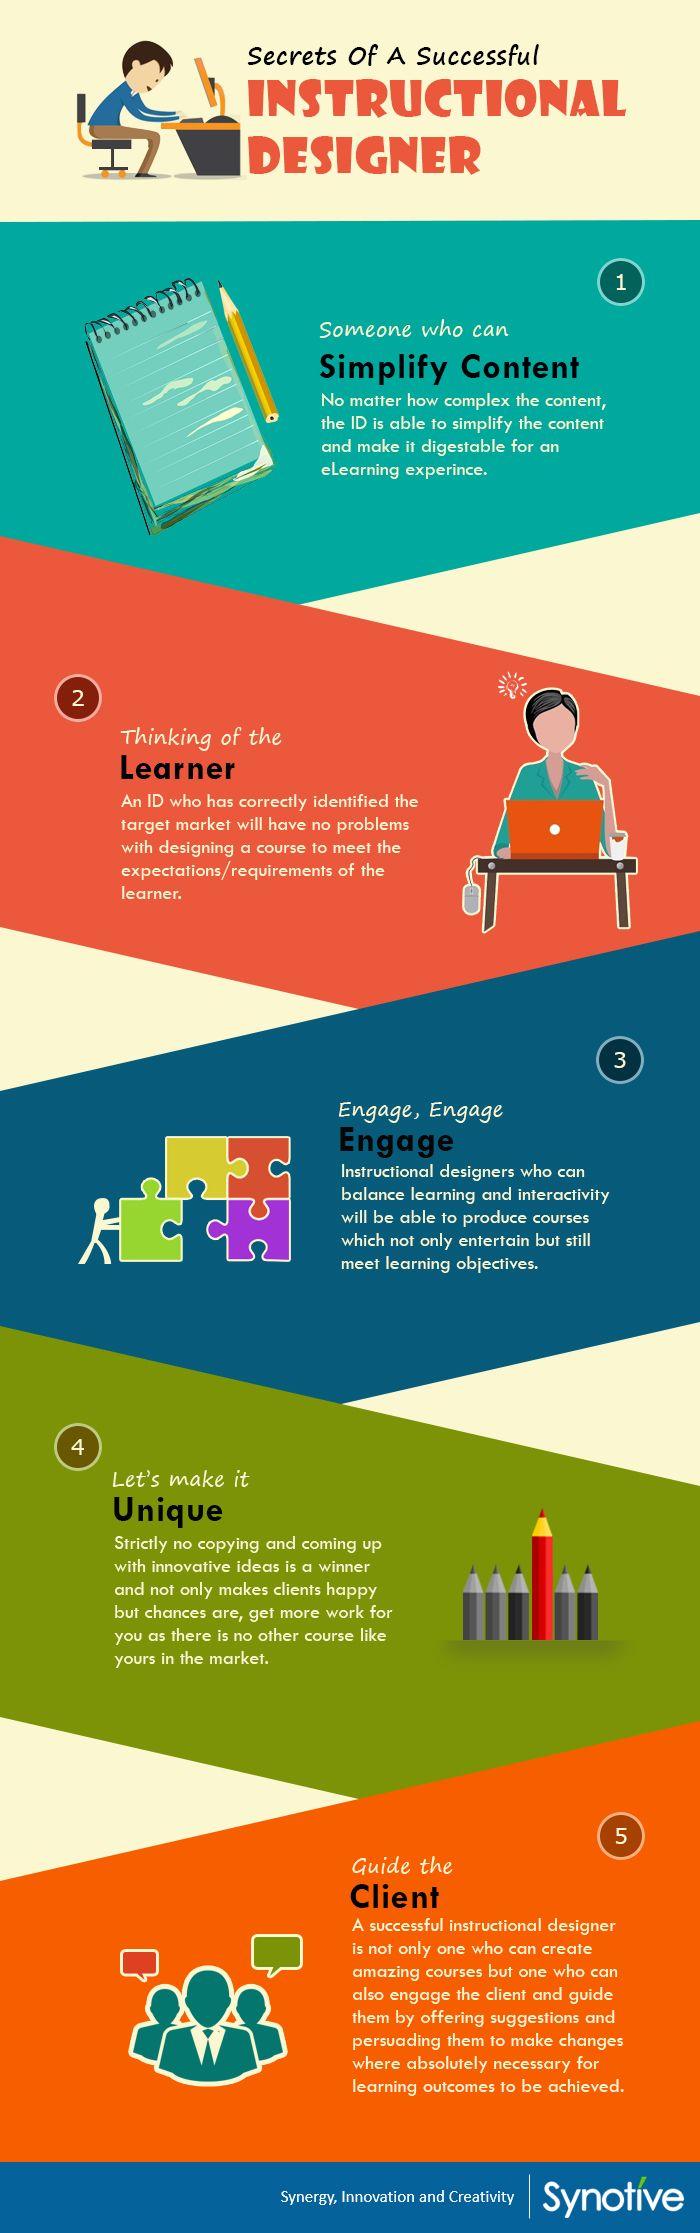 Design infographic online